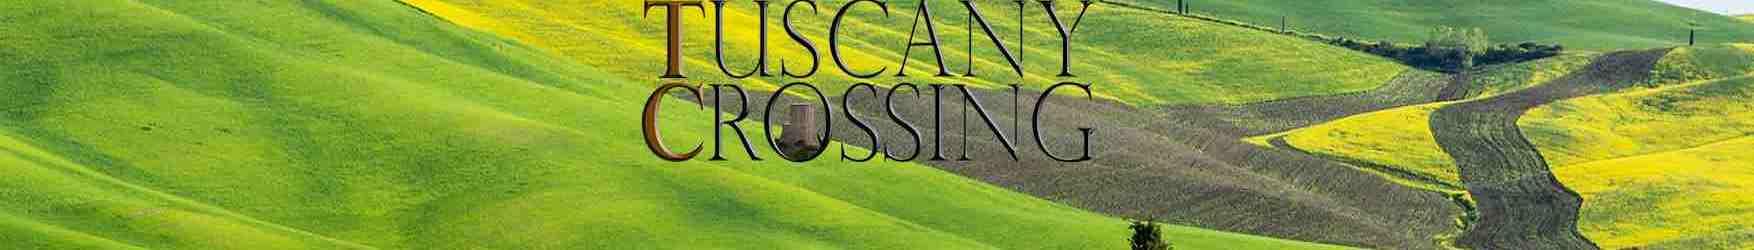 Tuscany Crossing 2021